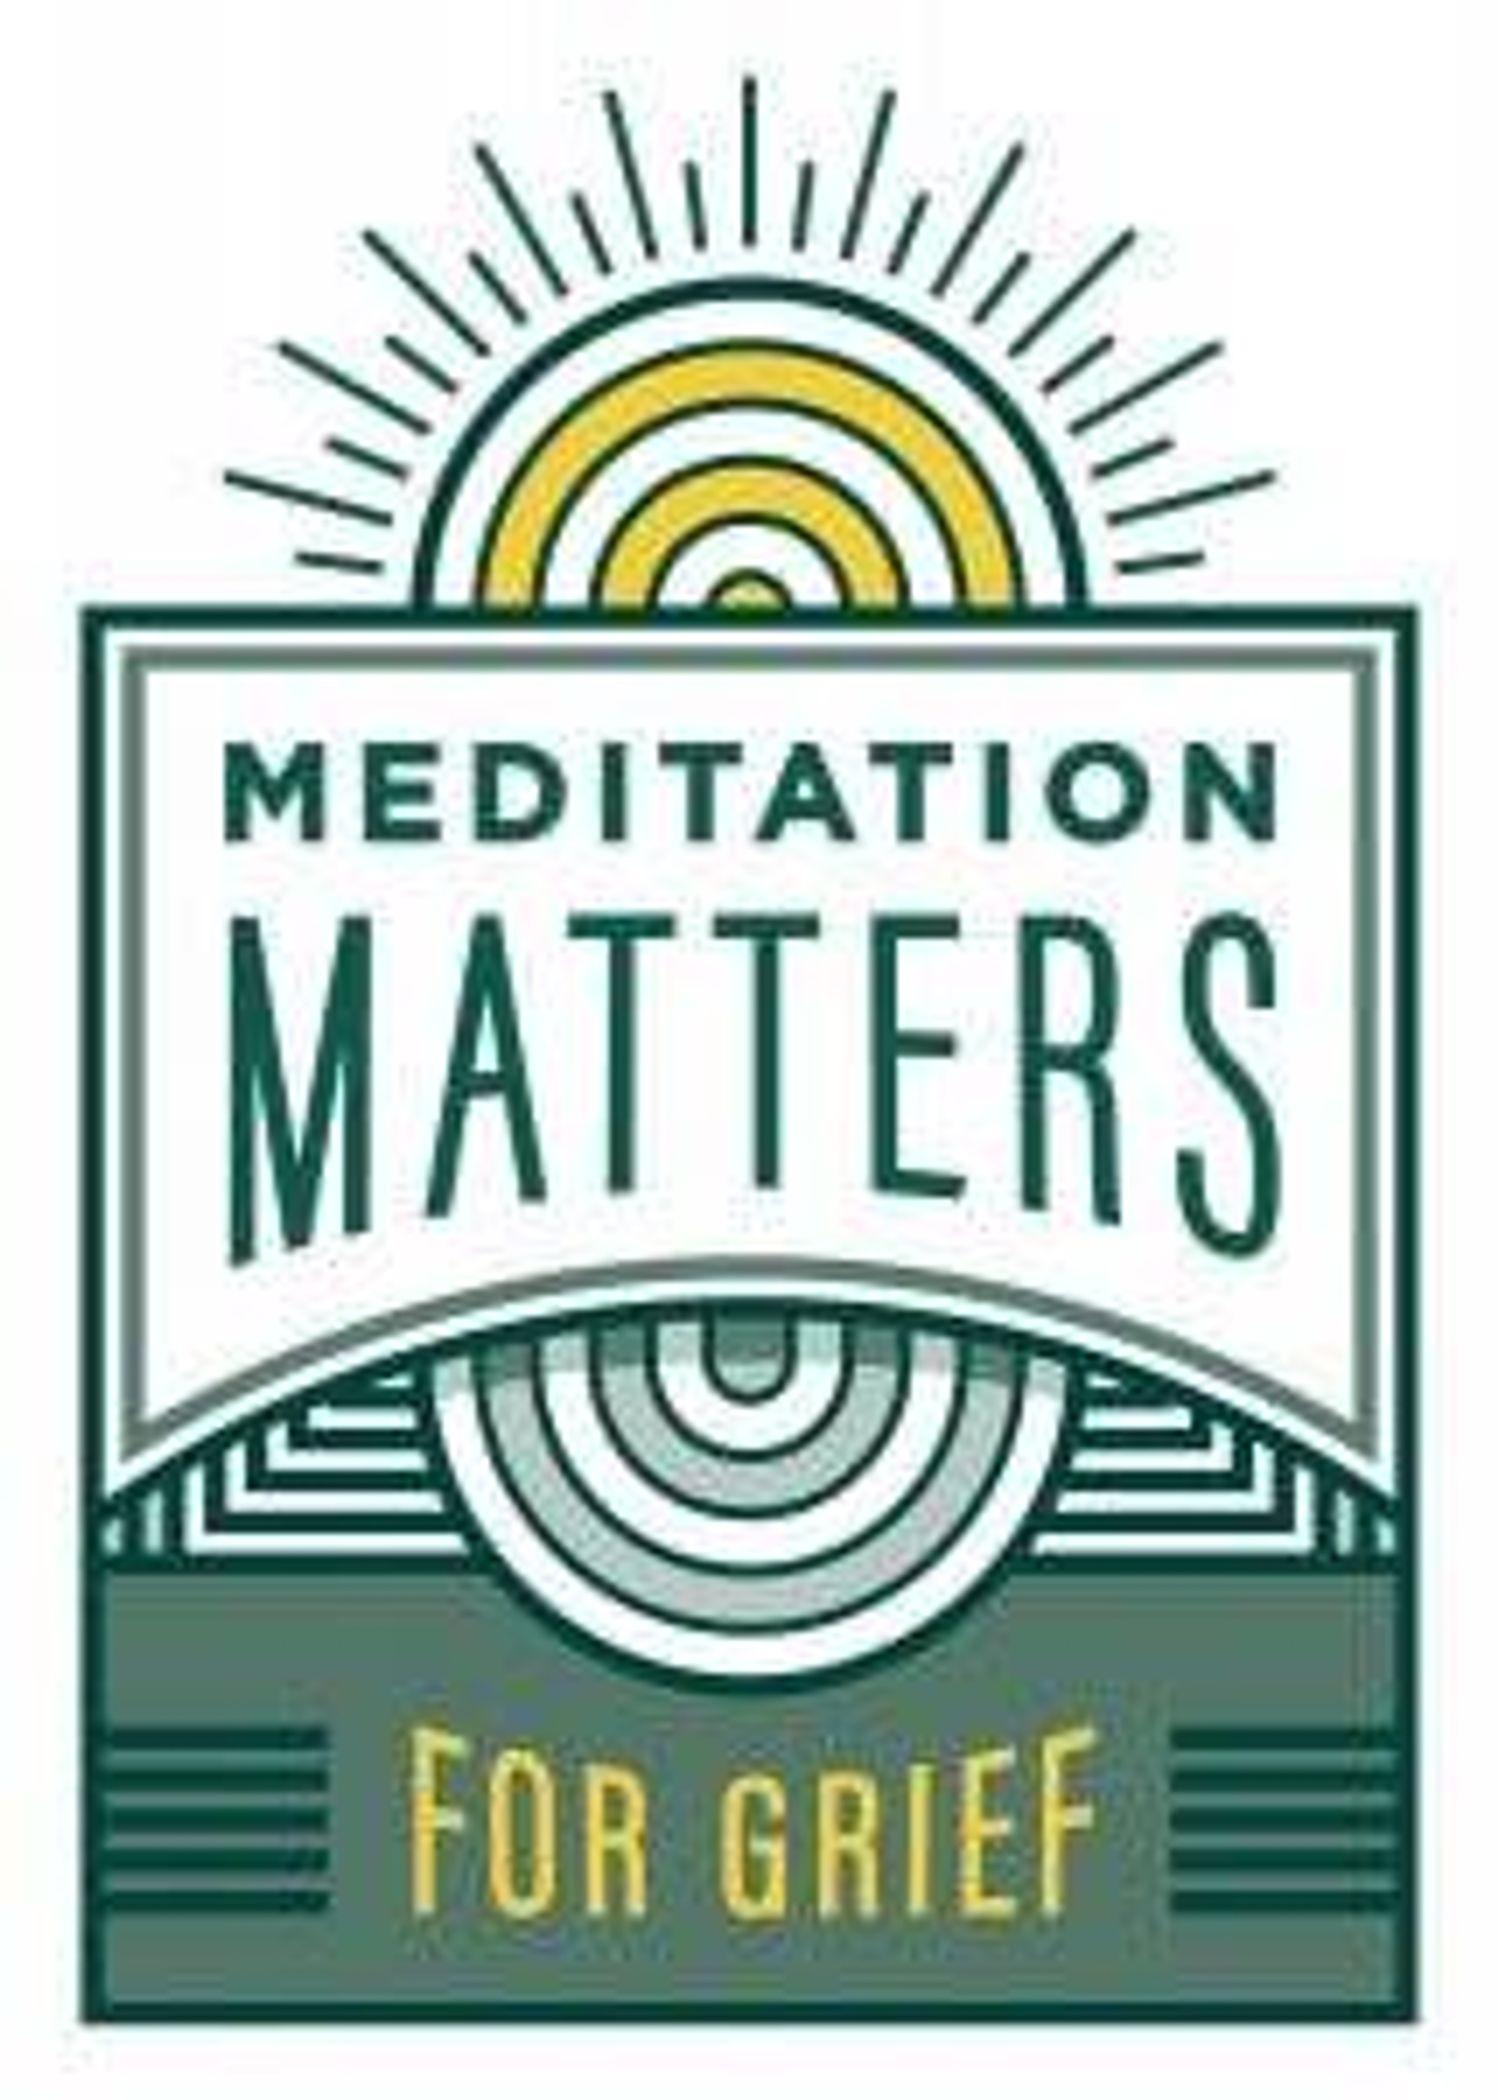 Meditation Matters – For Grief